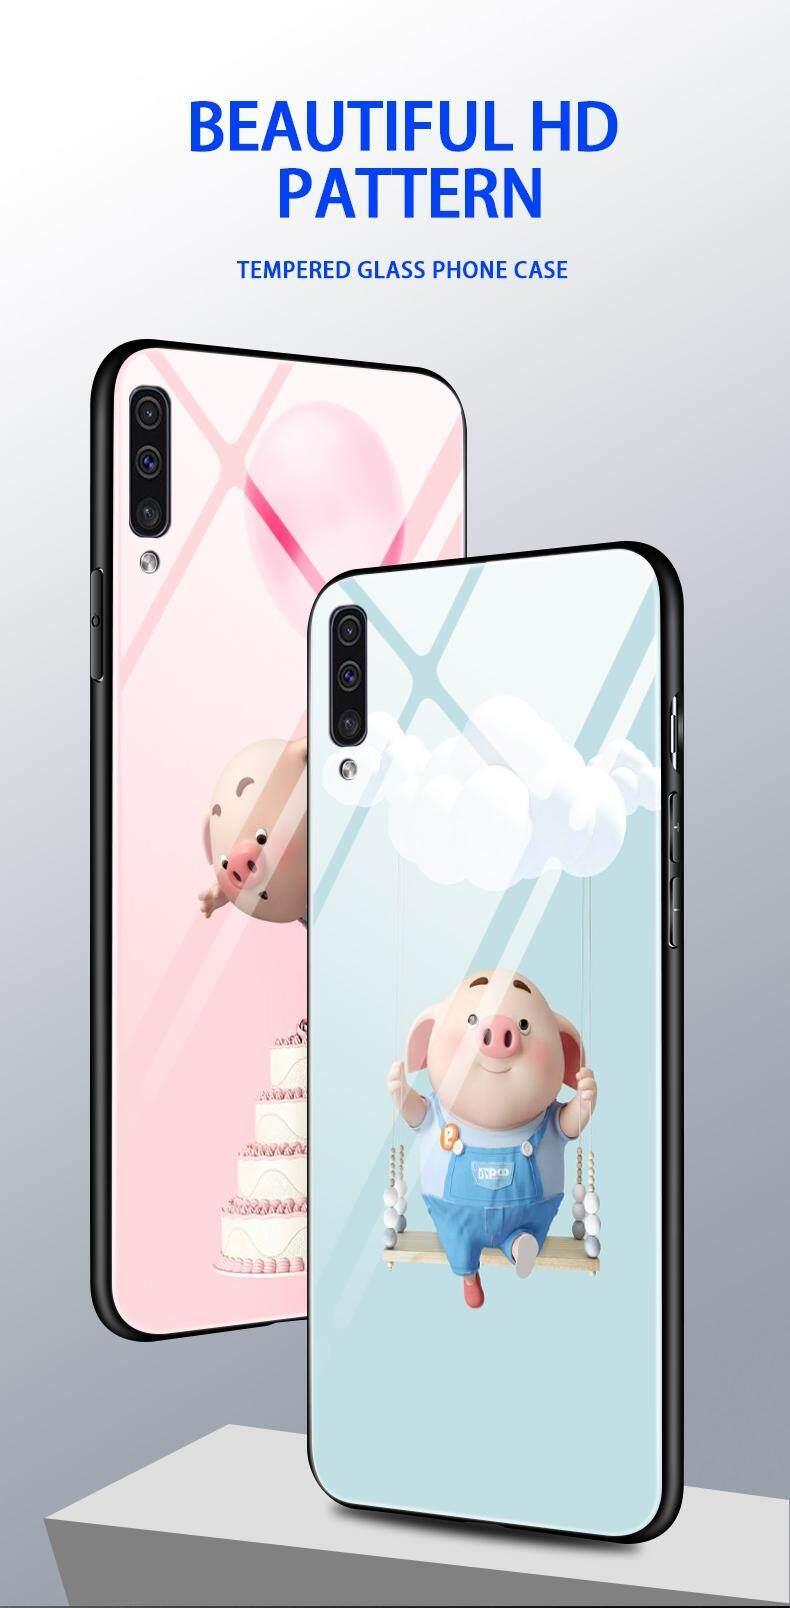 Maikcq Super Fashion Lucu Babi Kentut Kaos Gambar Kartun Kaca Antigores Plus Edge Tpu Pelindung Kejut Ponsel Case Cover Untuk Samsung Galaxy A50 2019